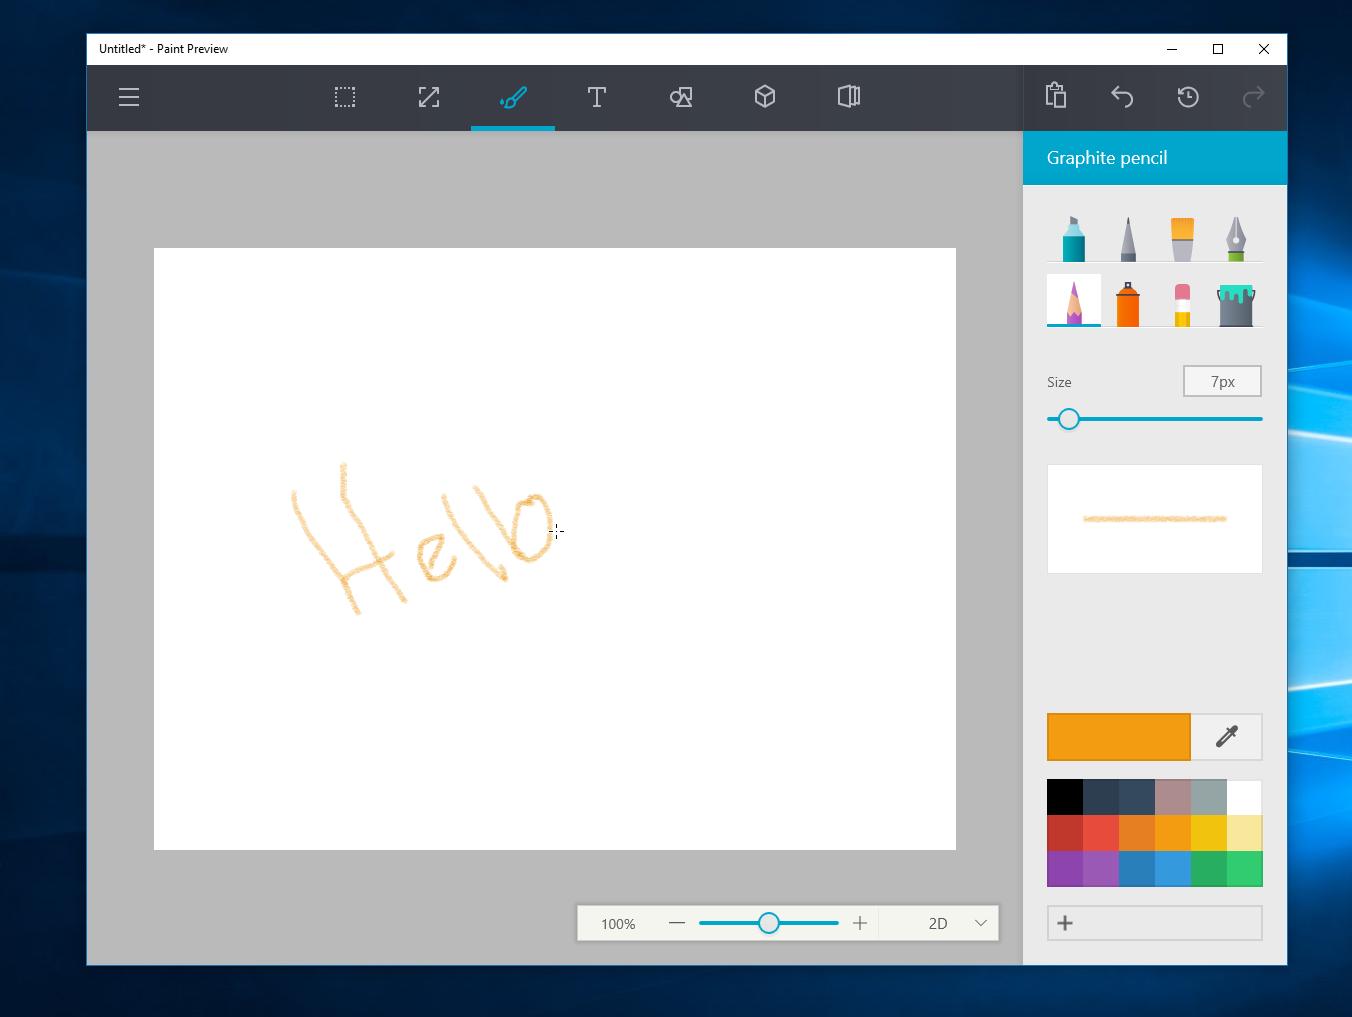 Instala el nuevo Paint en tu Windows 10 Anniversary Update x64